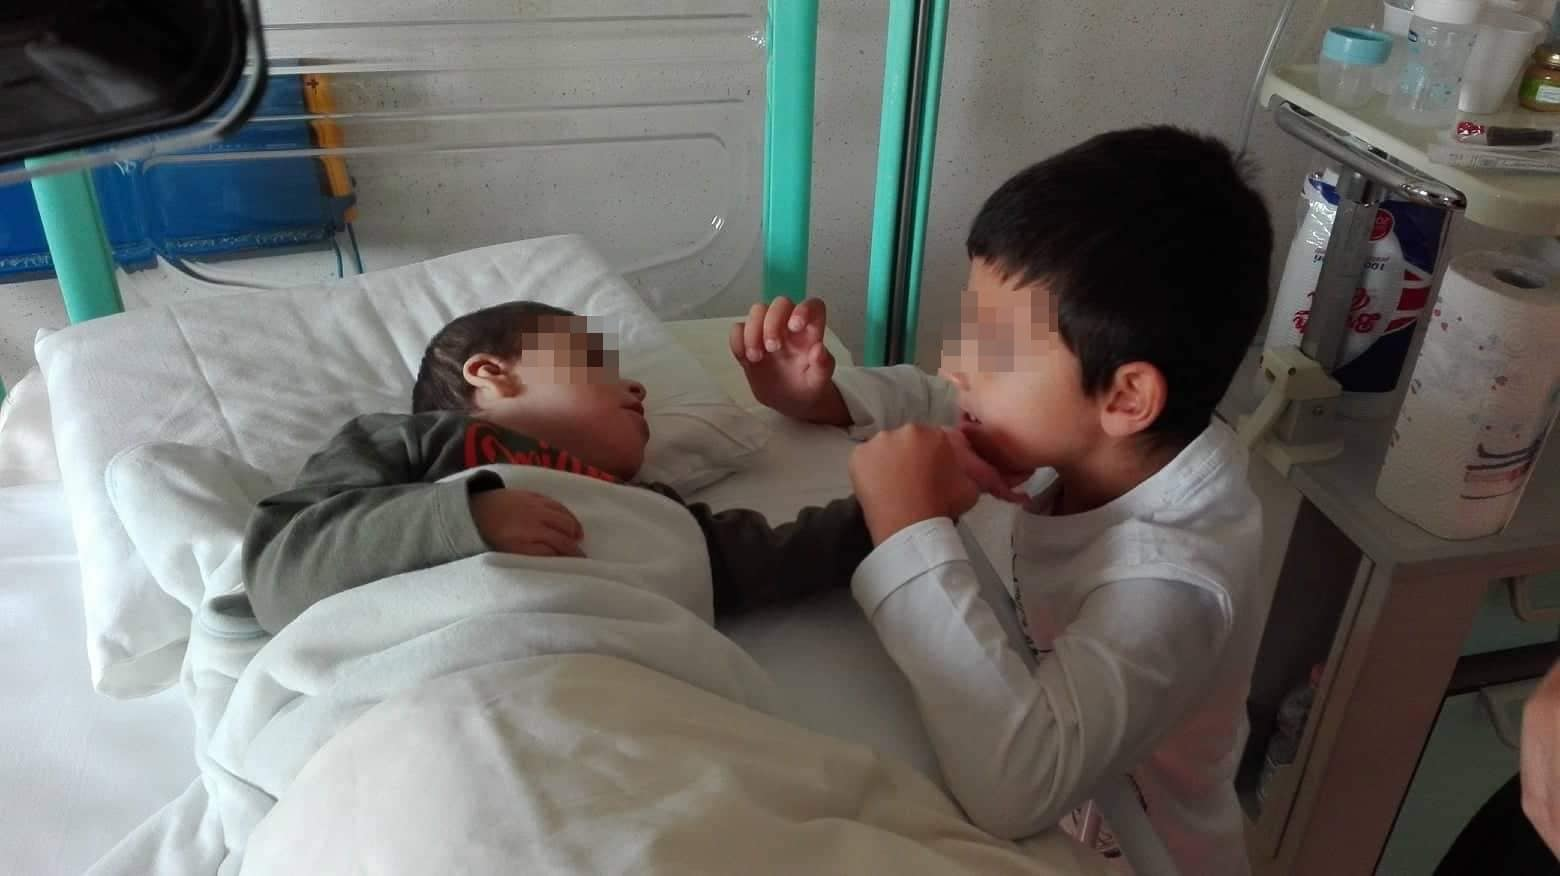 I due fratellini insieme.